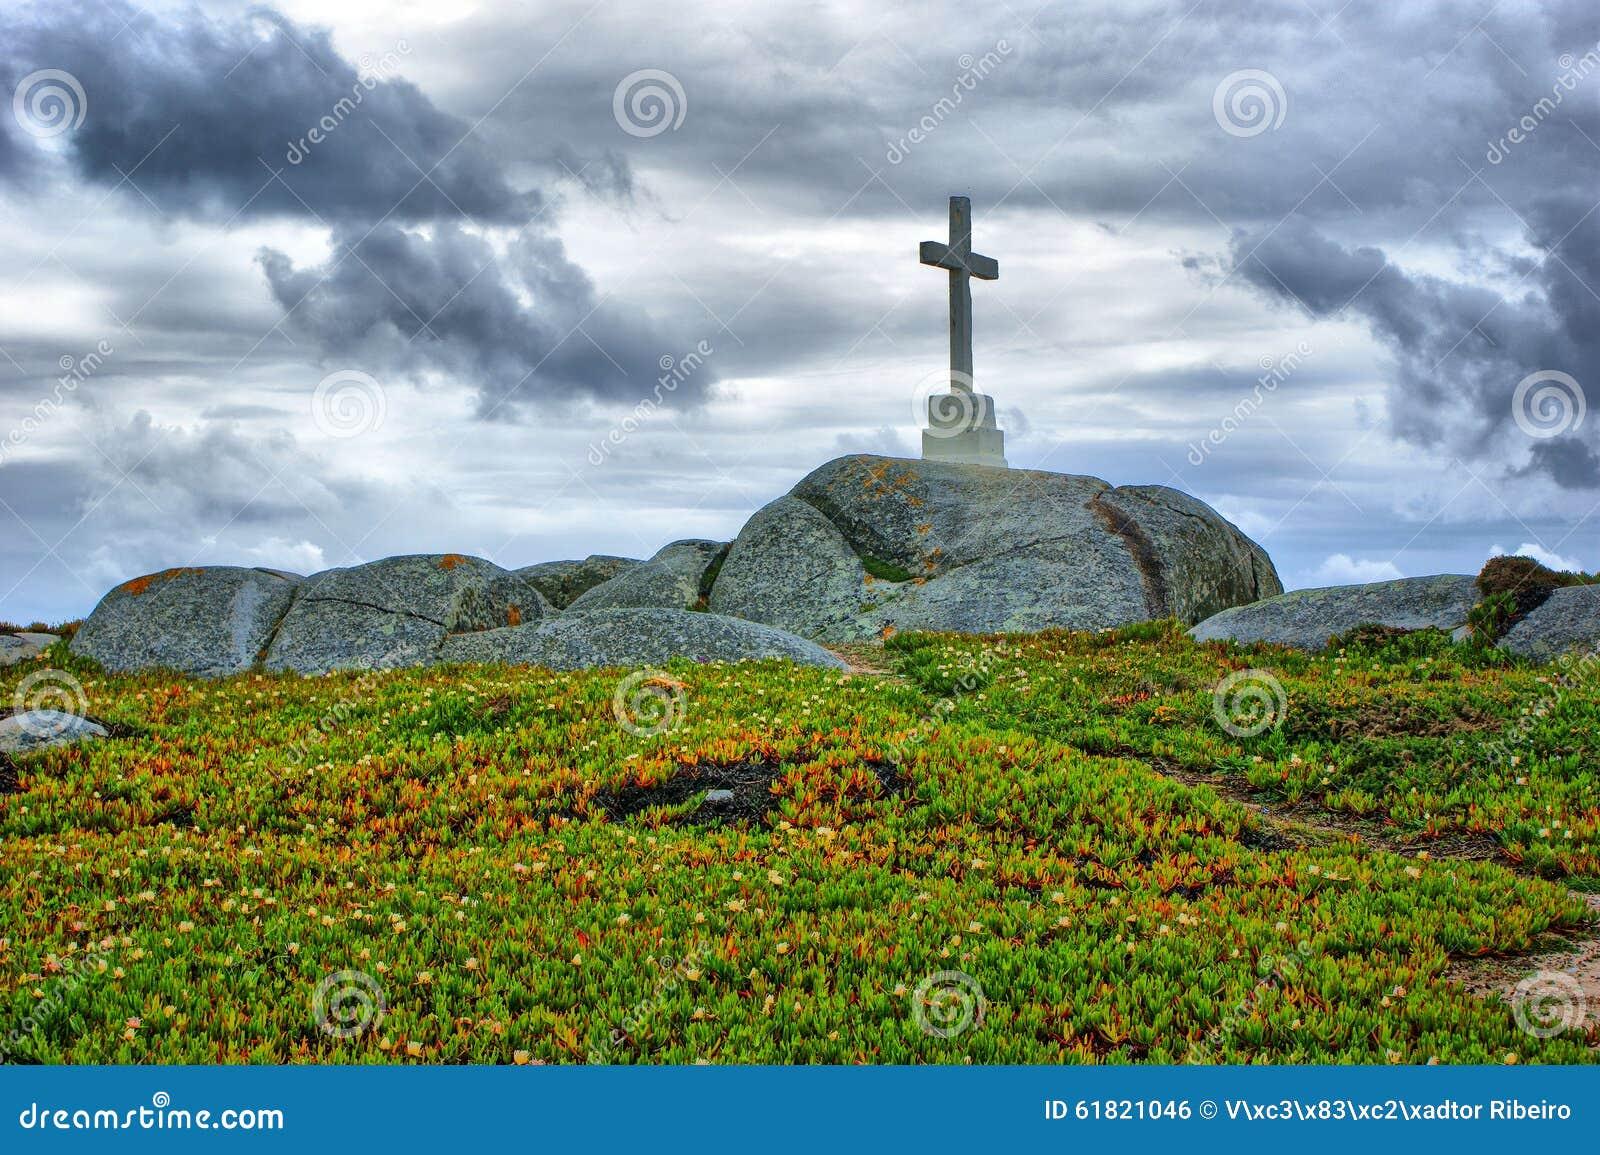 Cross on top of the granite rocks